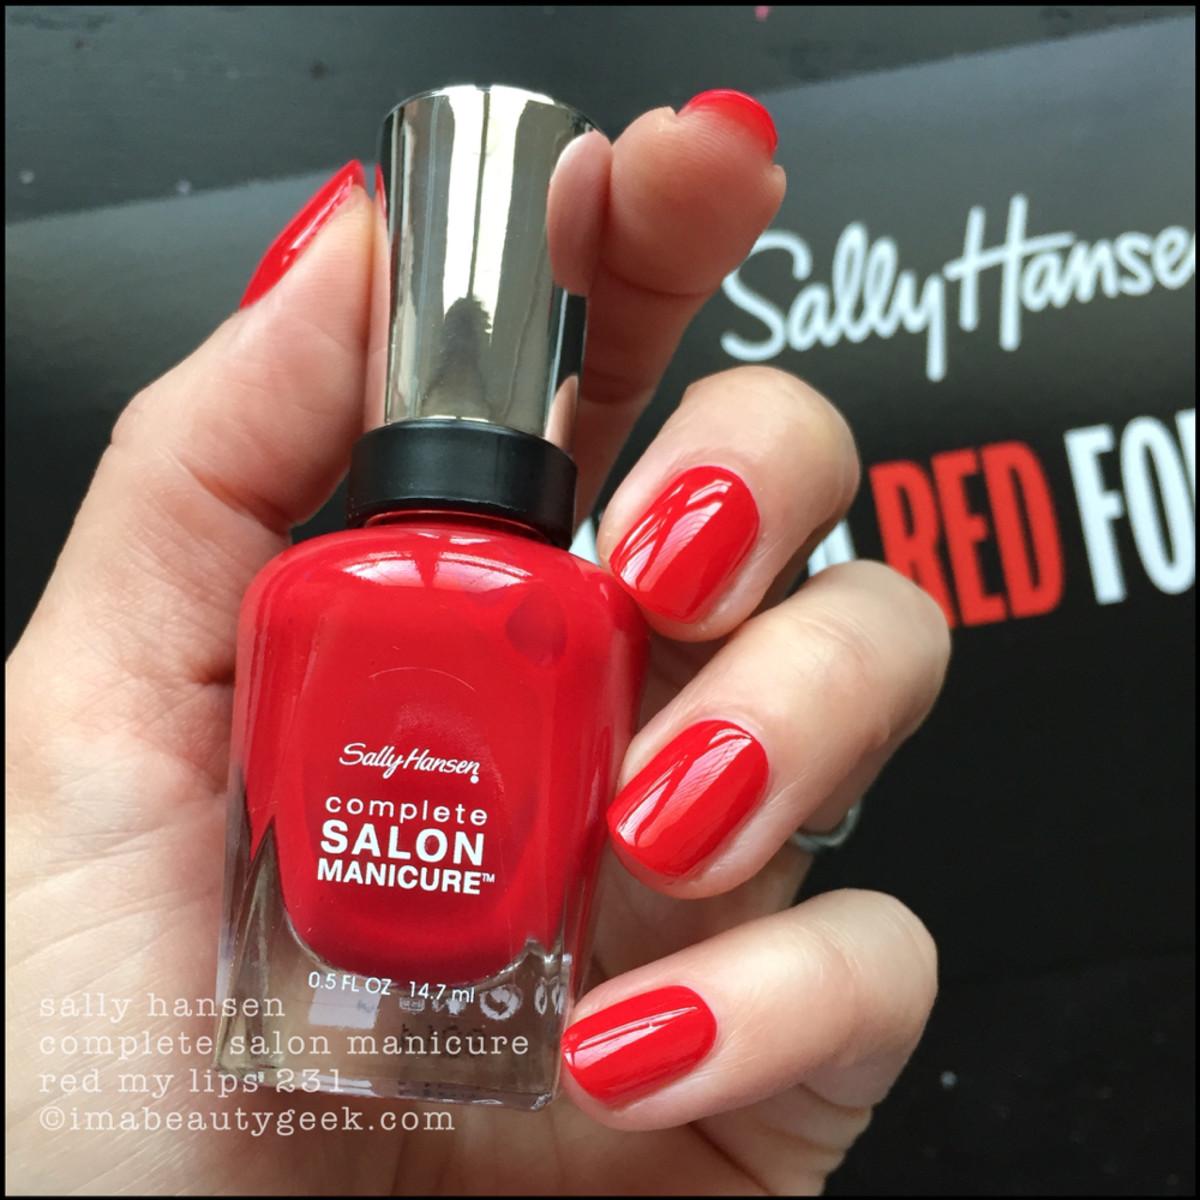 Sally Hansen Red My Lips 231 CSM - Red/esign Collection 2018